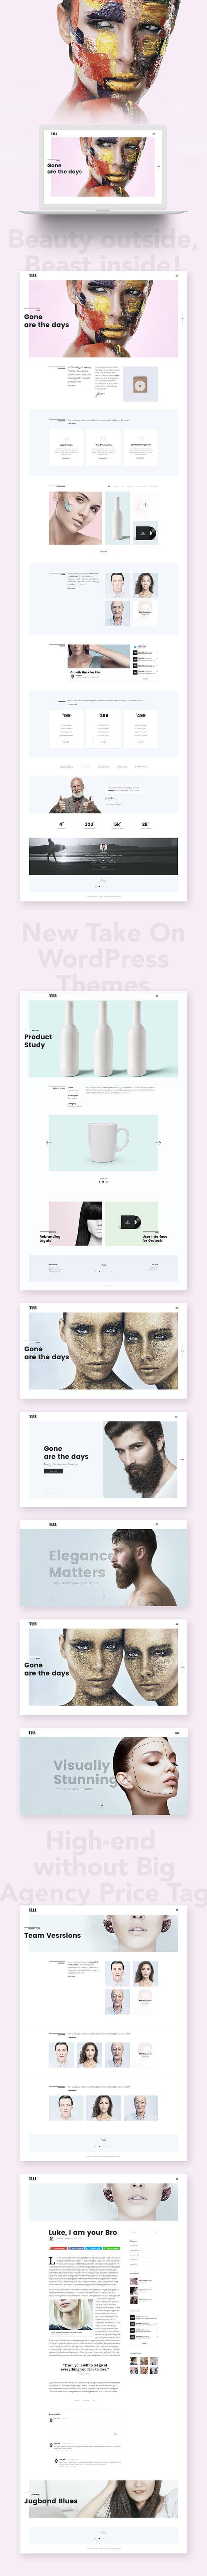 Untitled 2 2 - Adios - Portfolio Elementor WordPress Theme